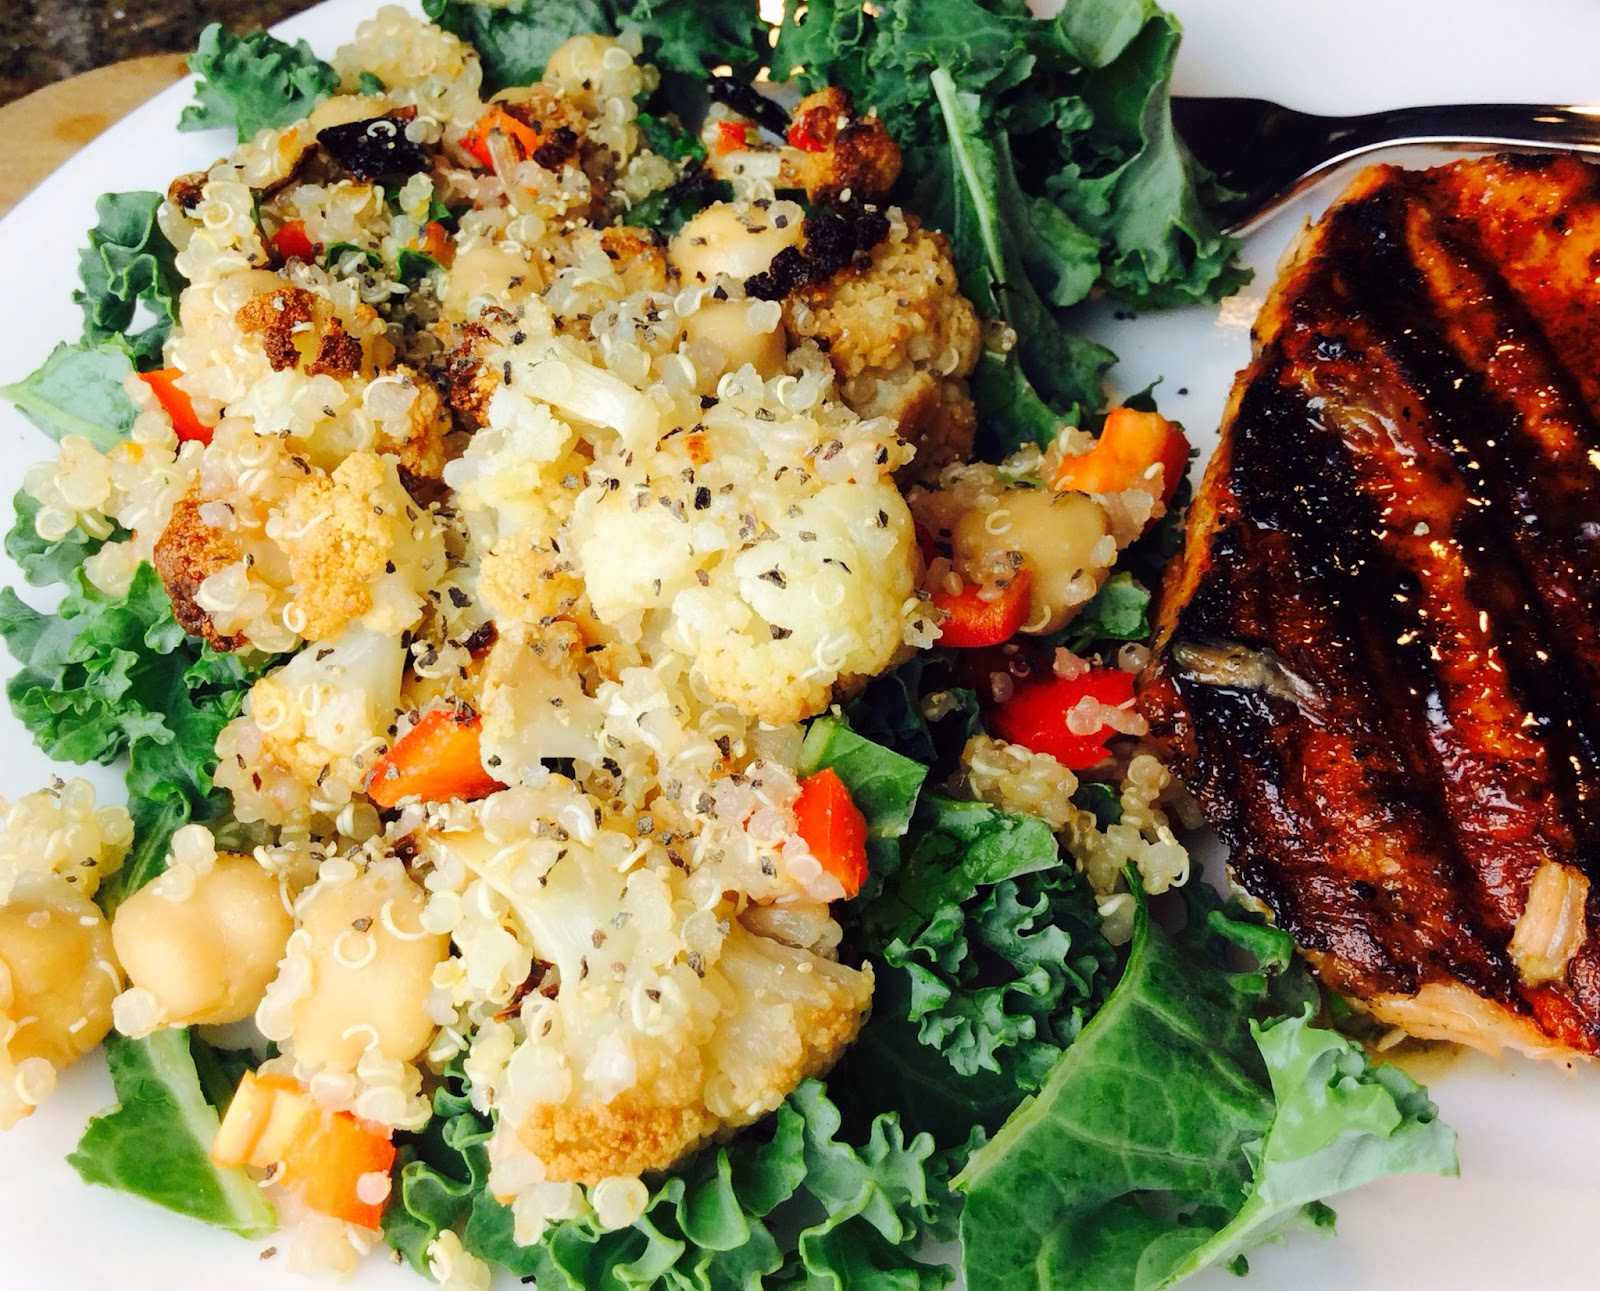 Food Fitness by Paige: Roasted Cauliflower Garbonzo Bean ...